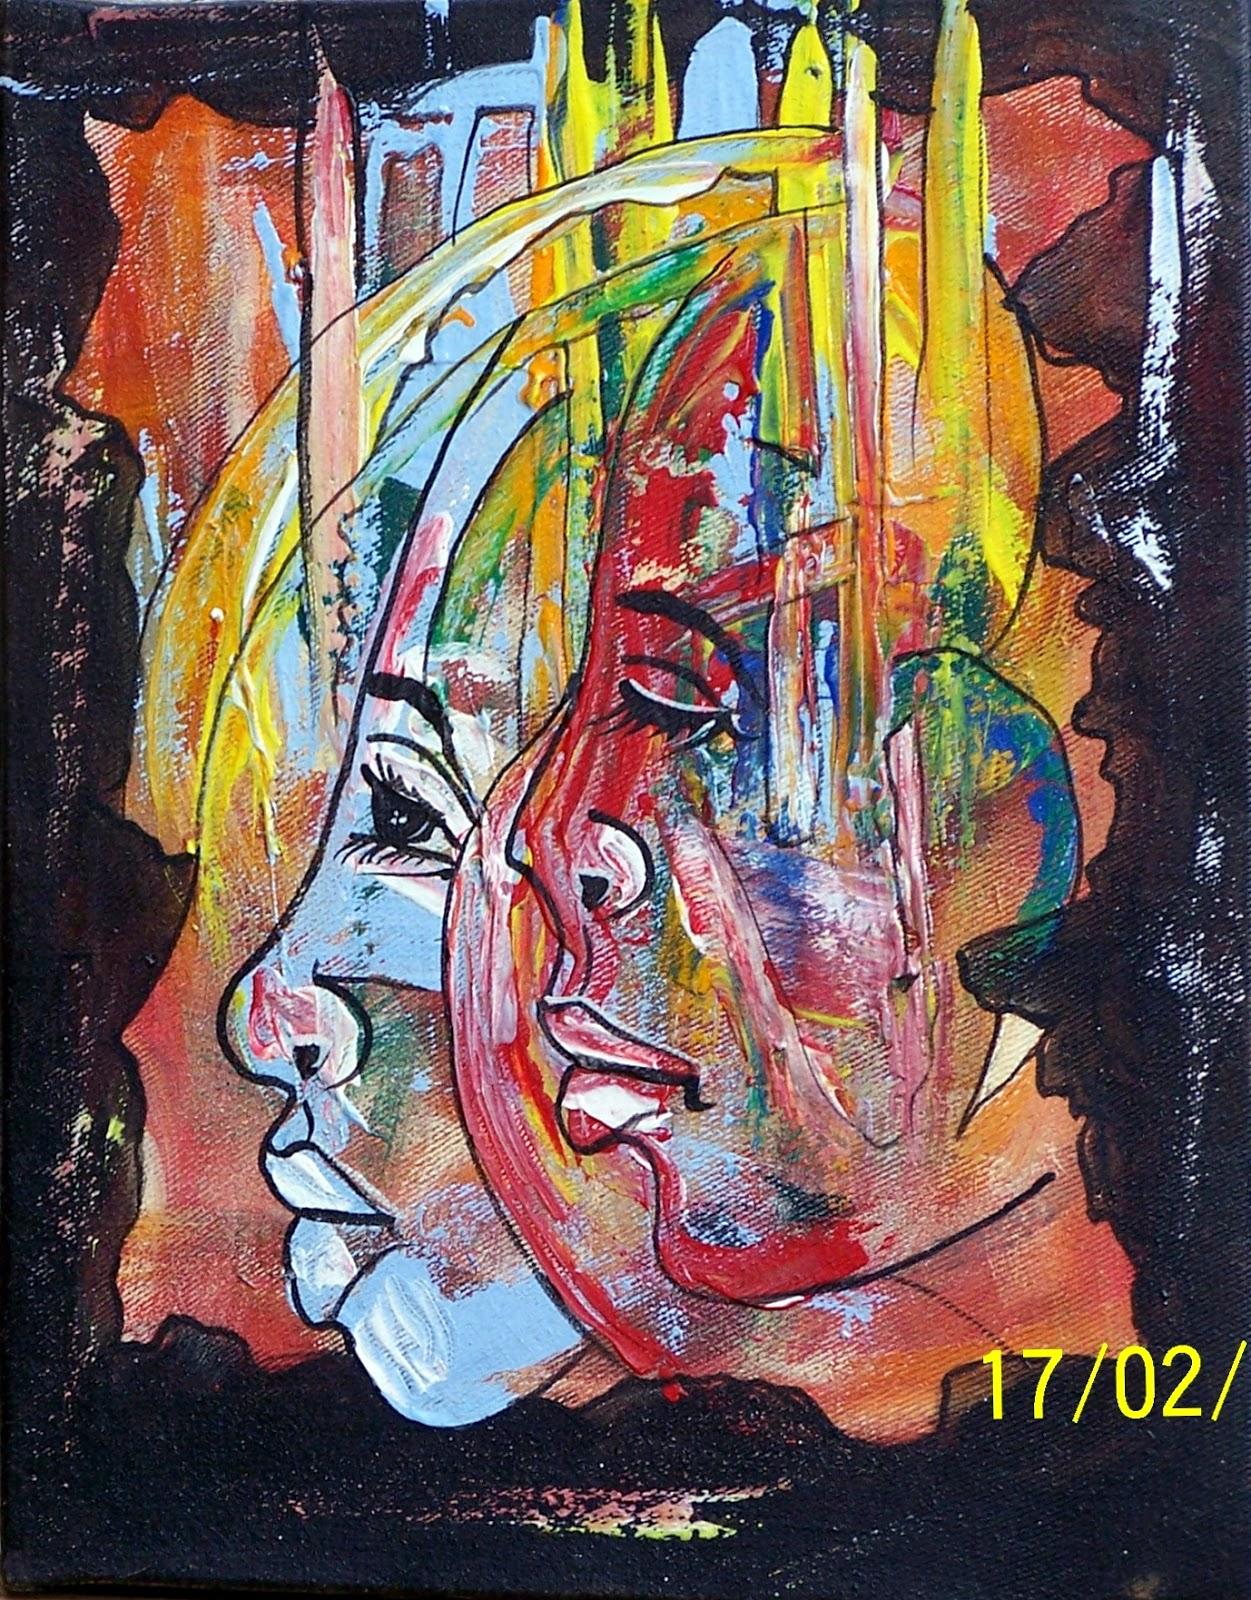 Haitianarts profils couleurs cadres